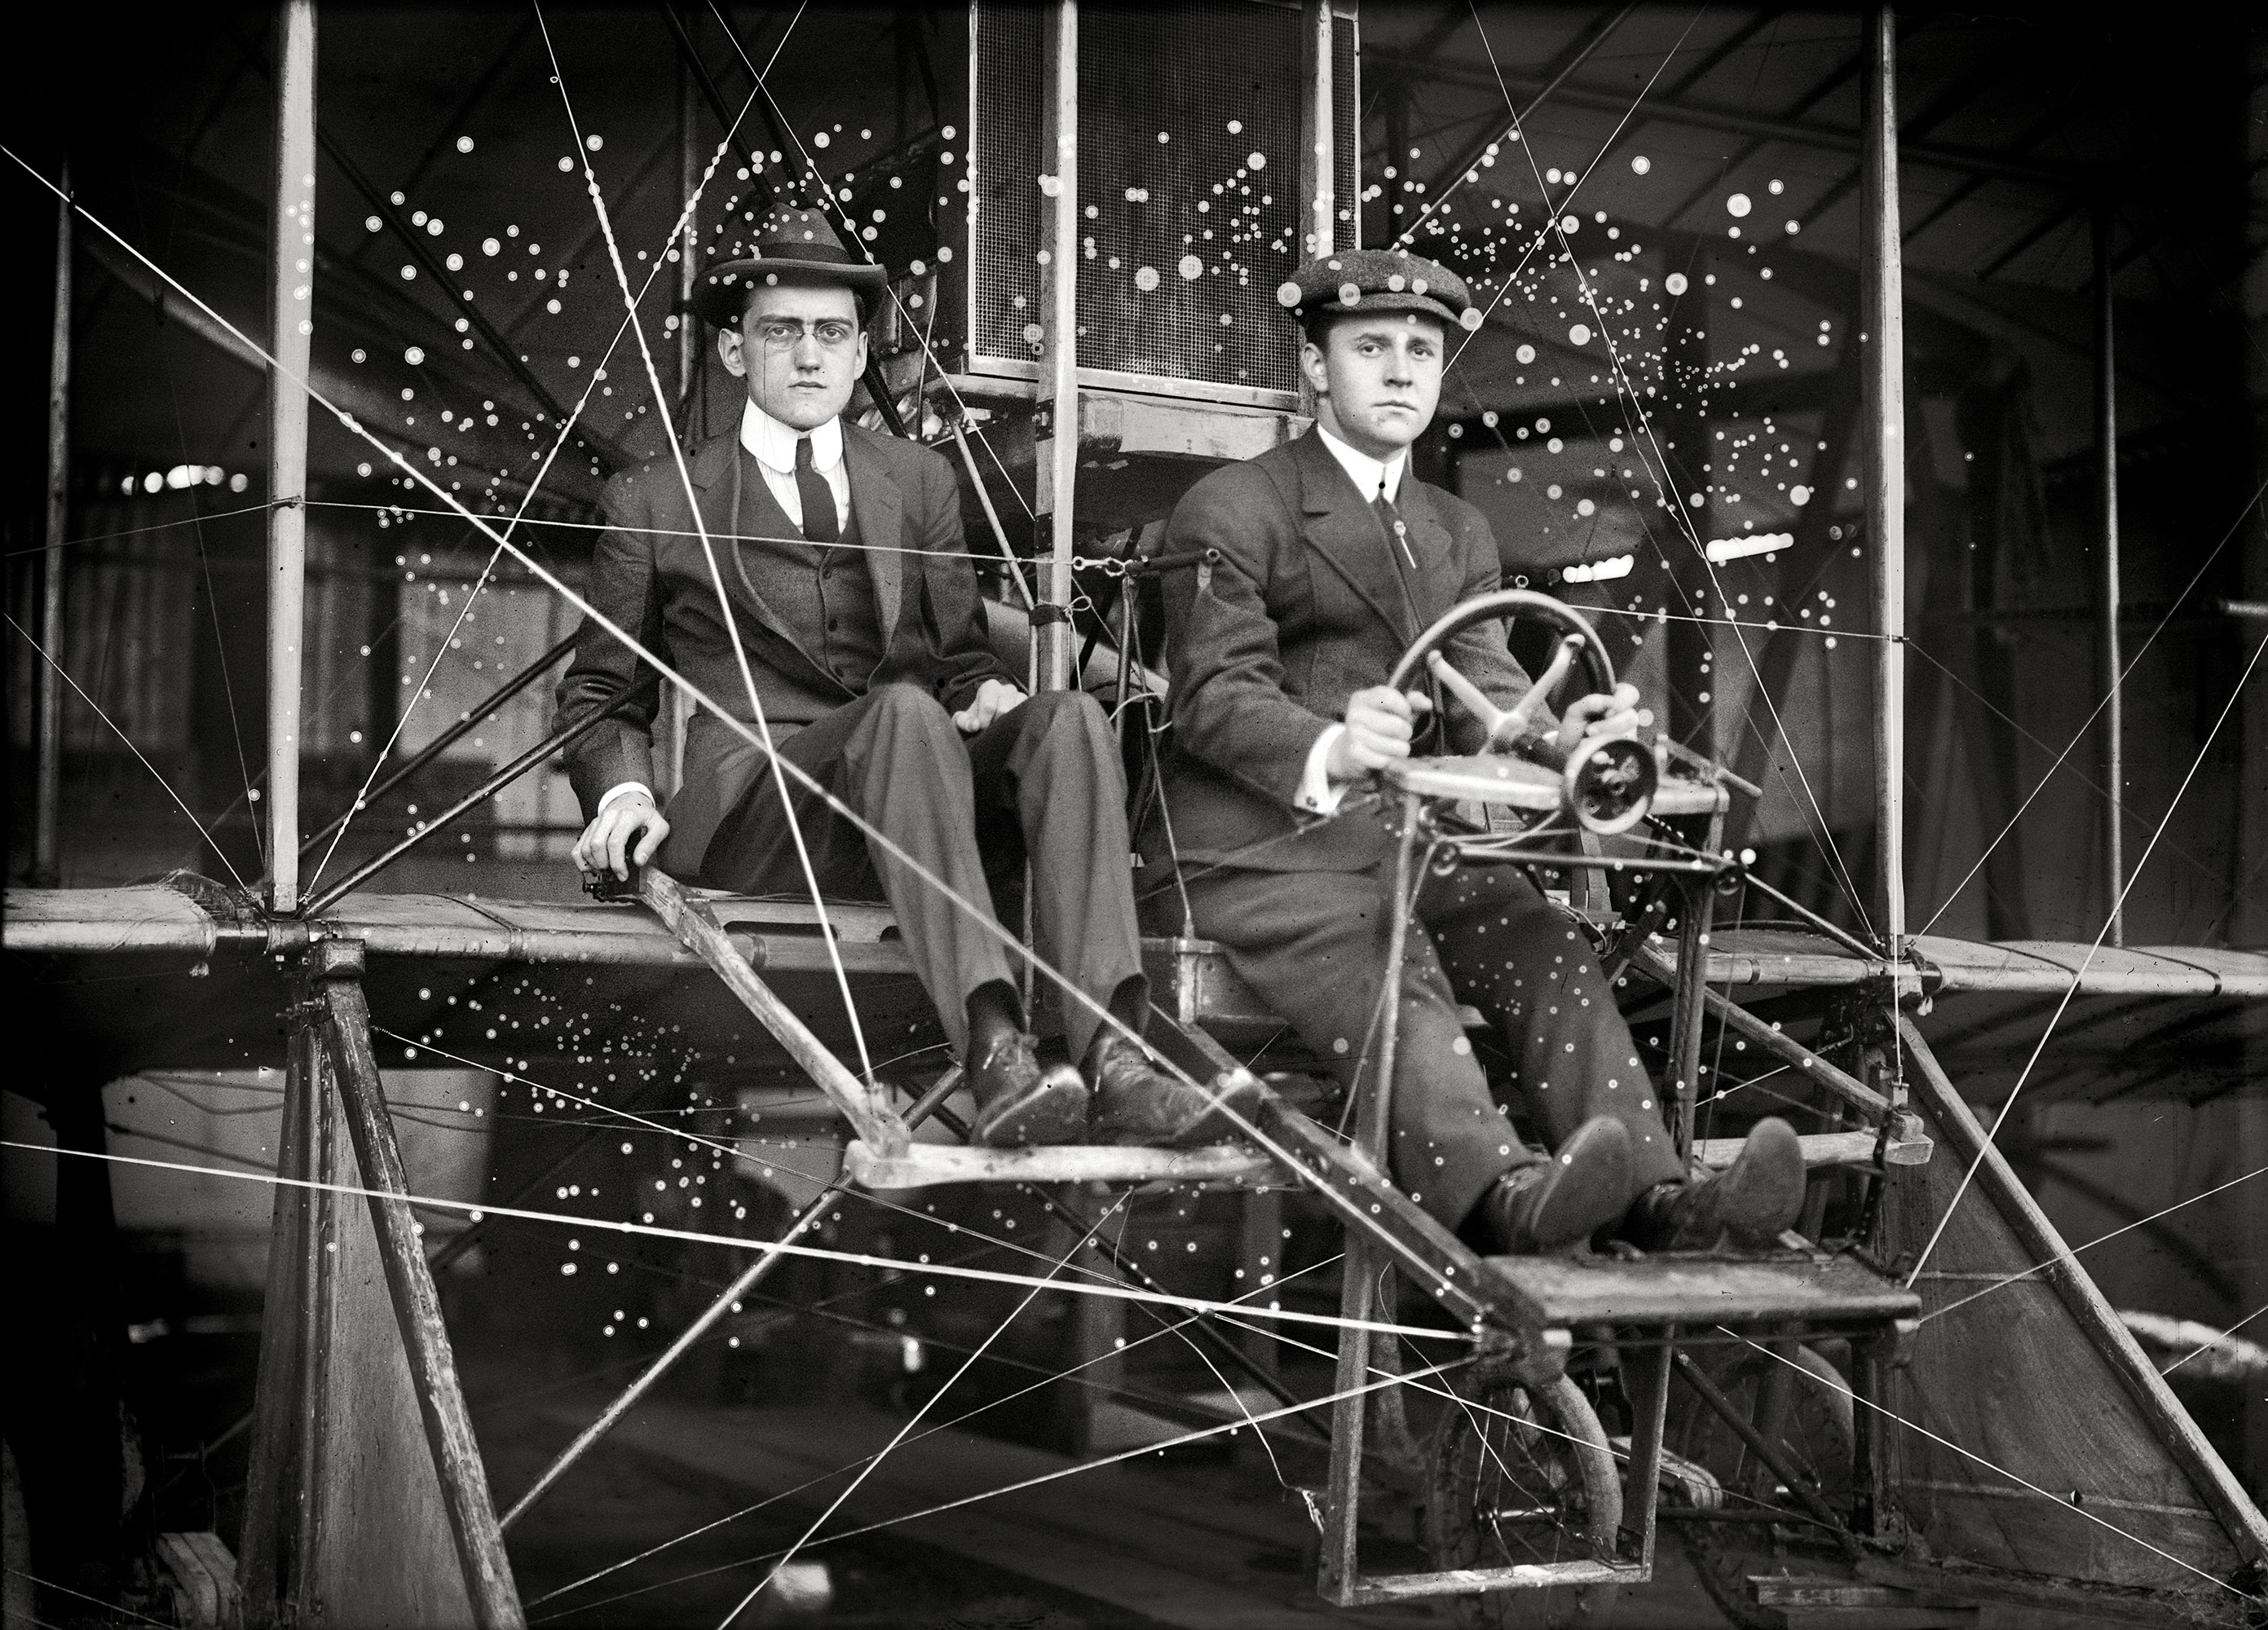 Washington, D.C., circa 1911.  Flights and test of Rex Smith biplane flown by Antony Jannus. The plane with Rufus R. Bermann, wireless operator, and Fred Aubert.